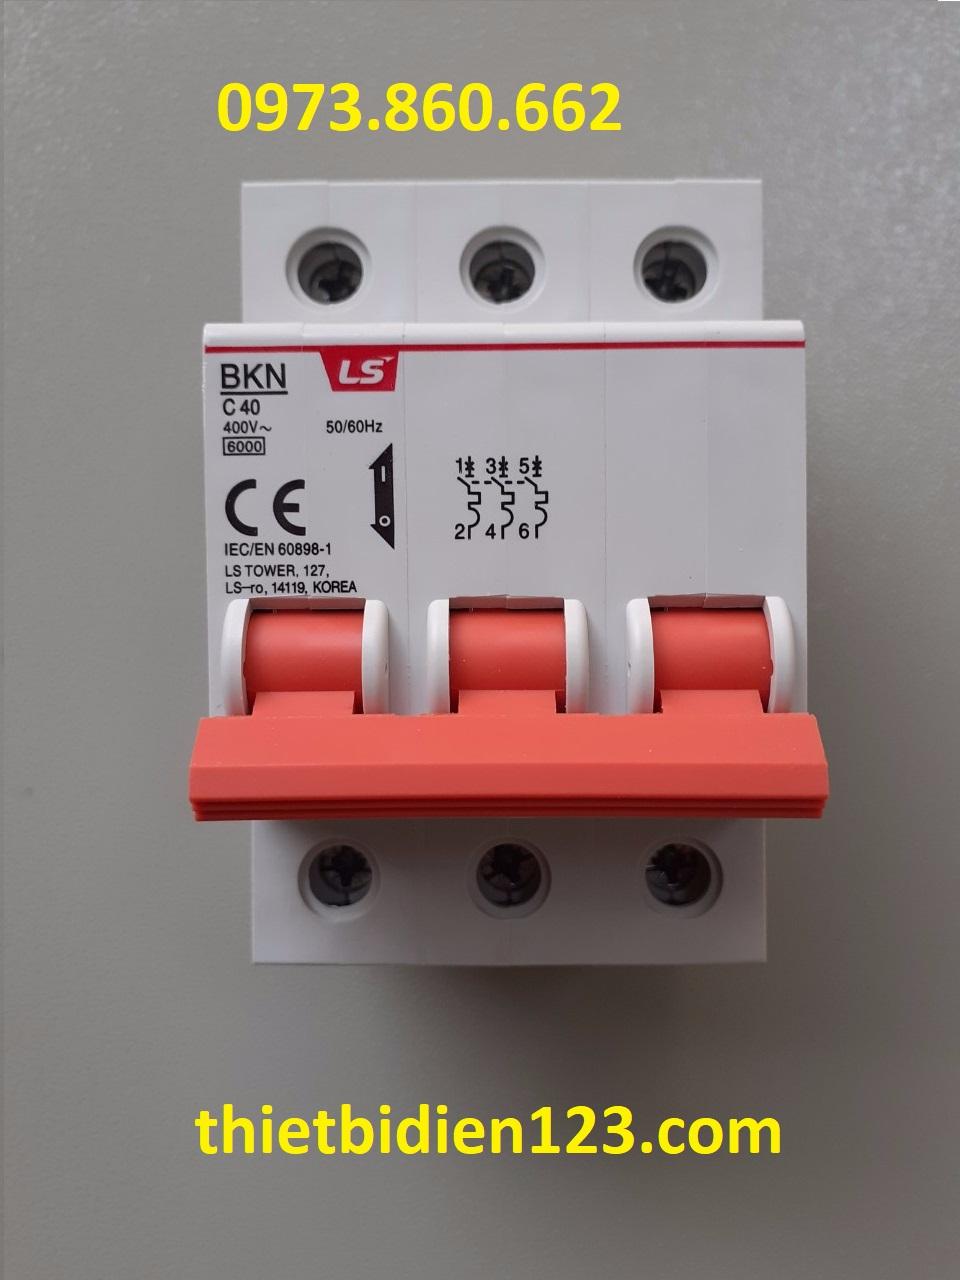 Aptomat LS MCB 3P 16A~63A